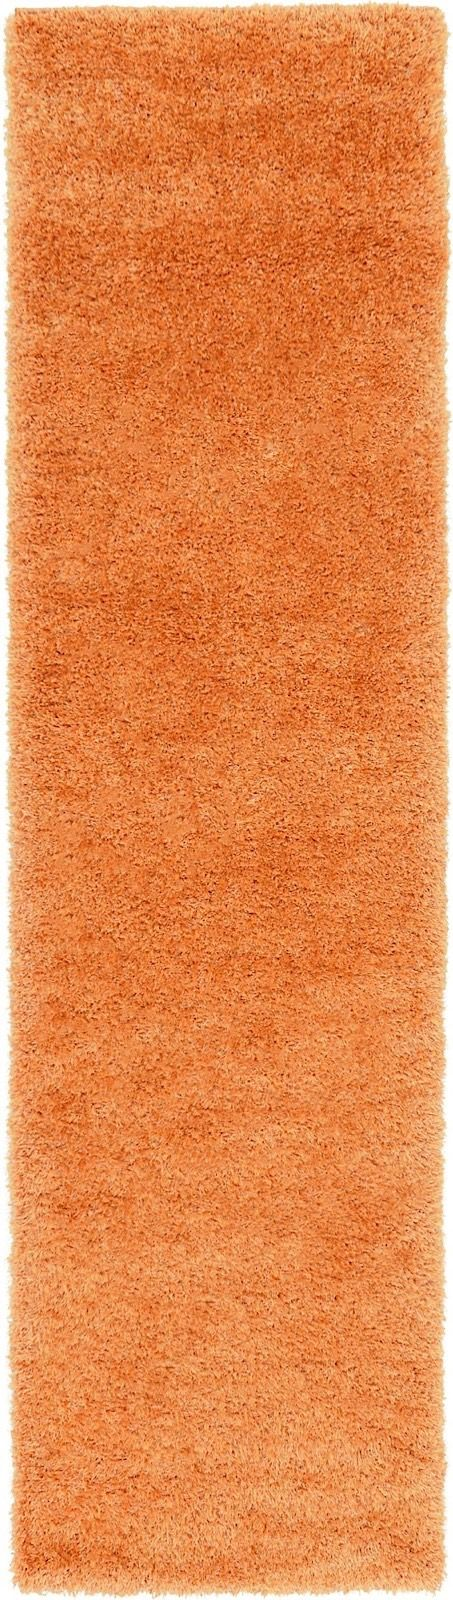 rugpal splendid shag shag area rug collection